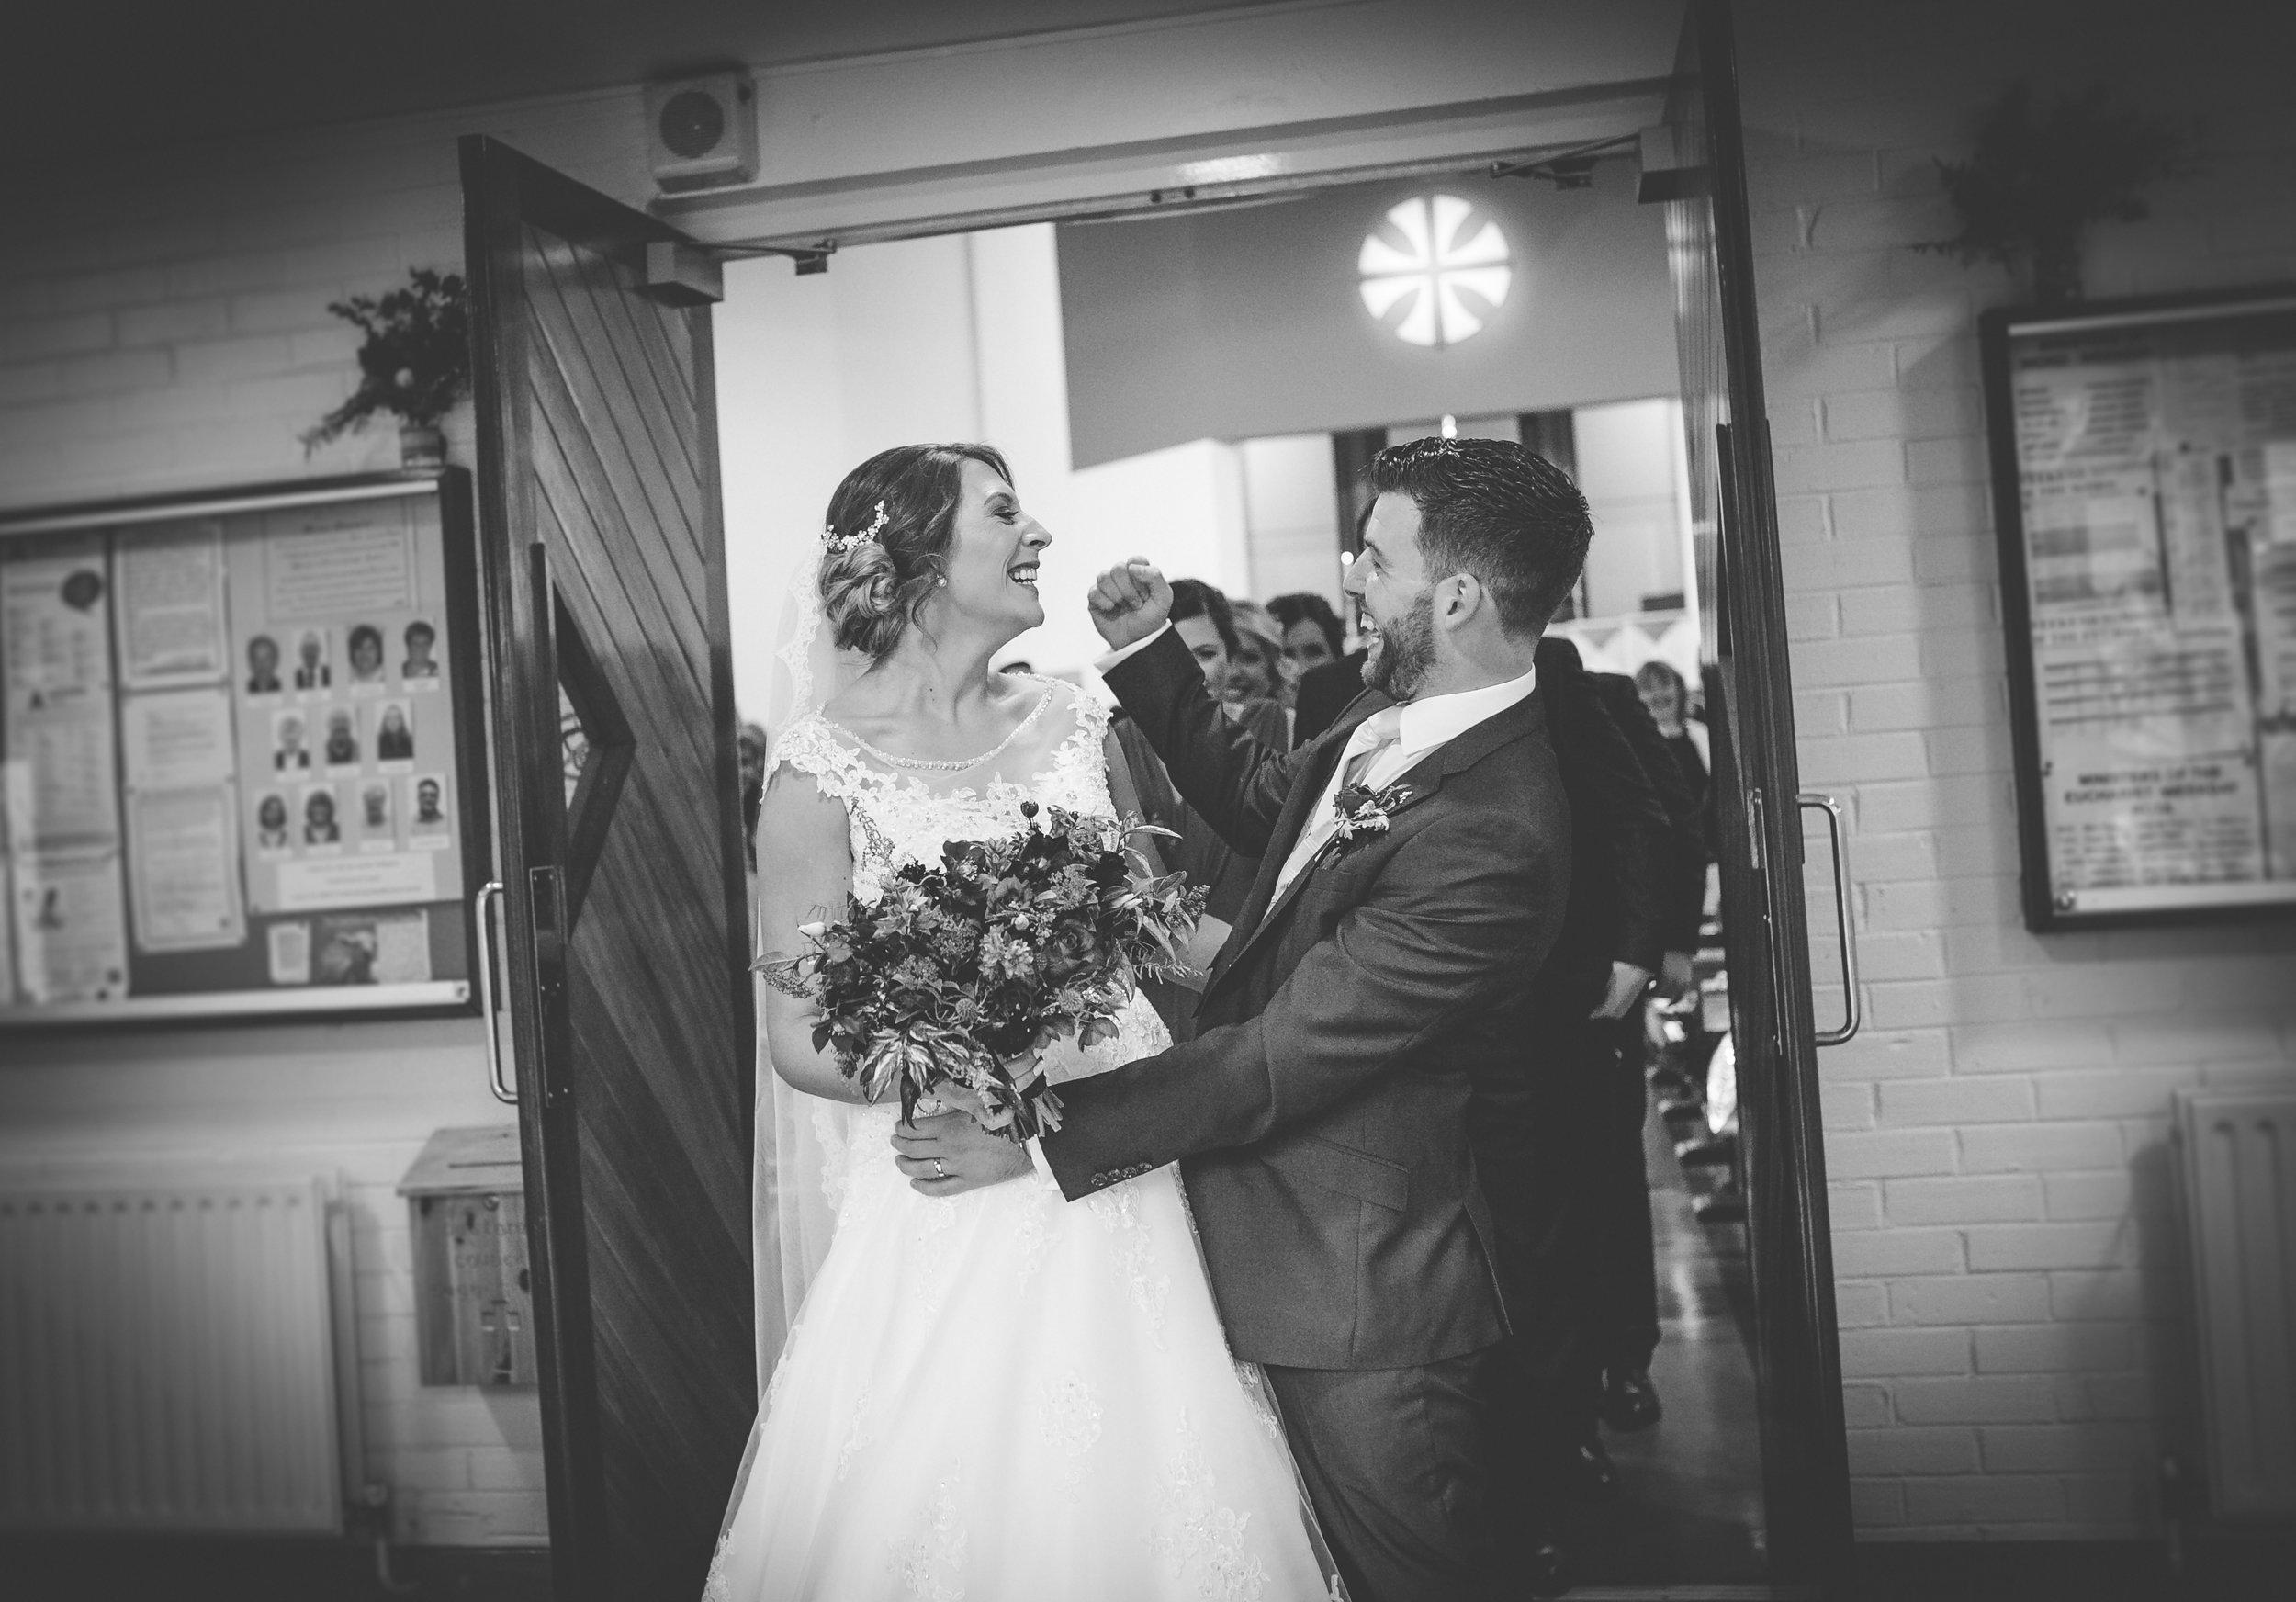 Knoghtsbrook hotel wedding044.jpg